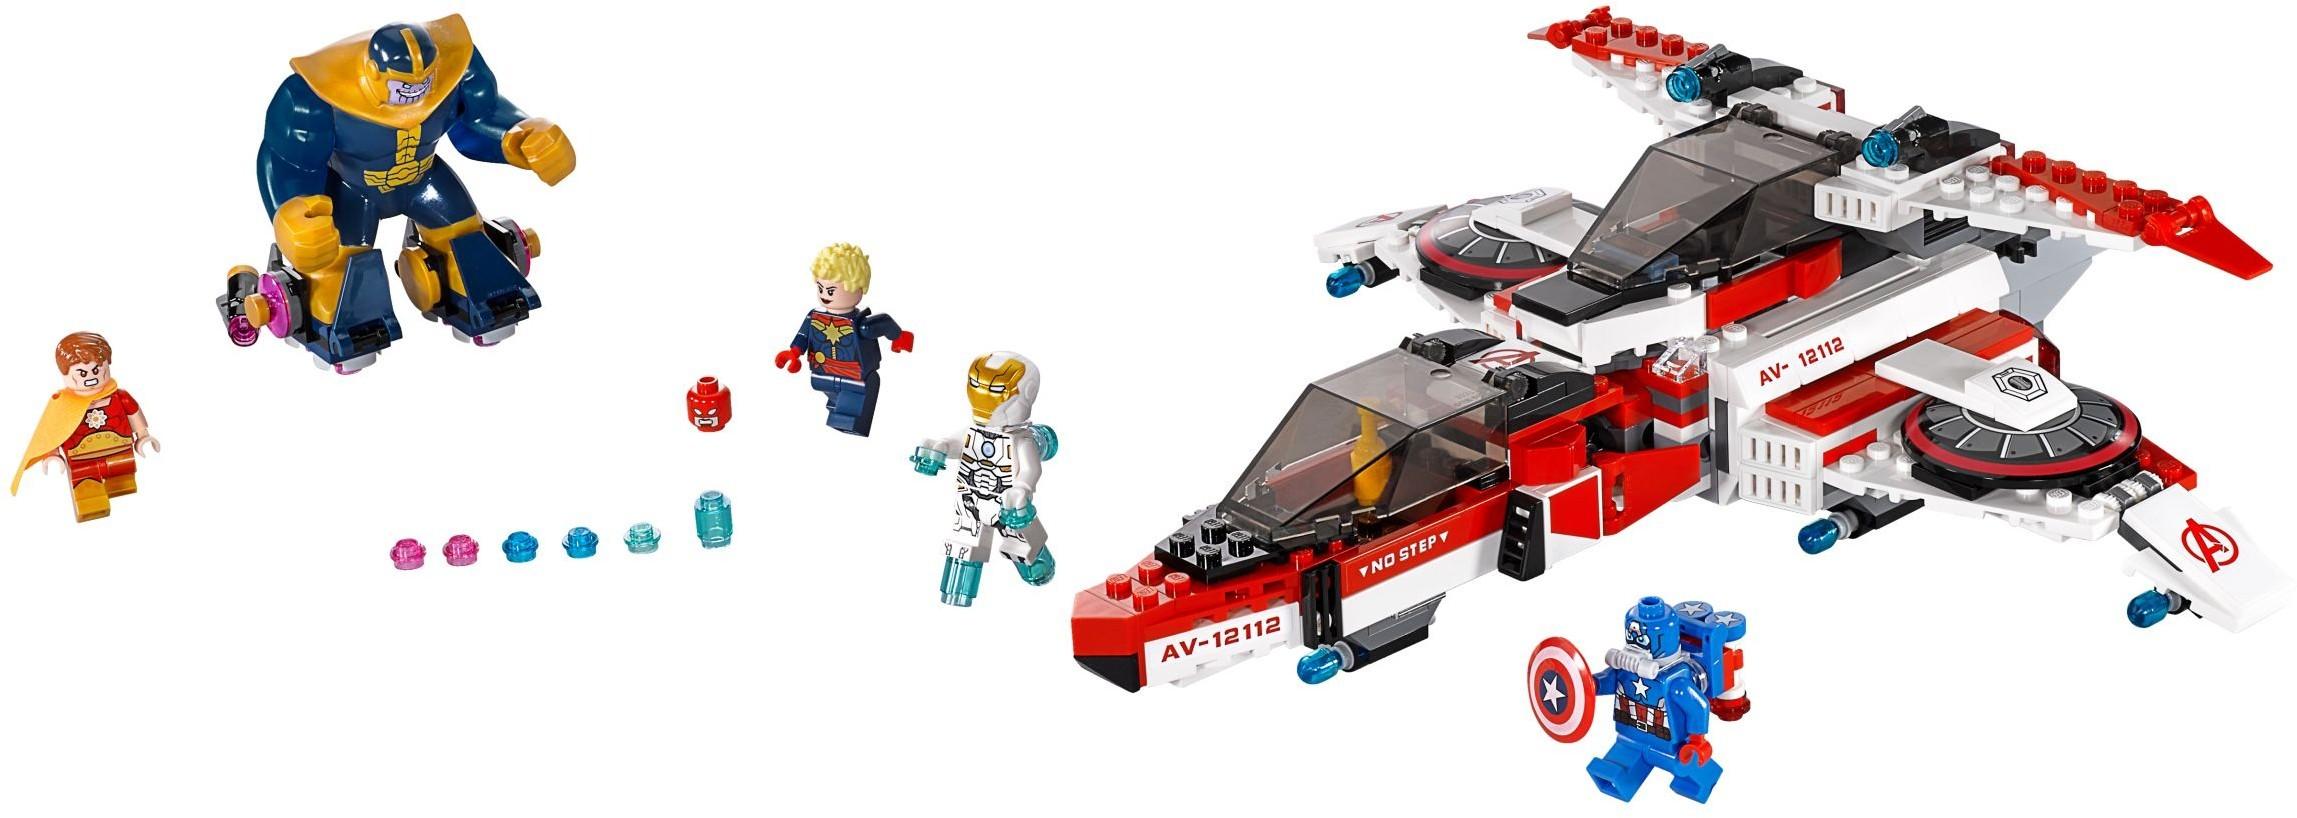 LEGO Marvel Super Heroes 76049 pas cher